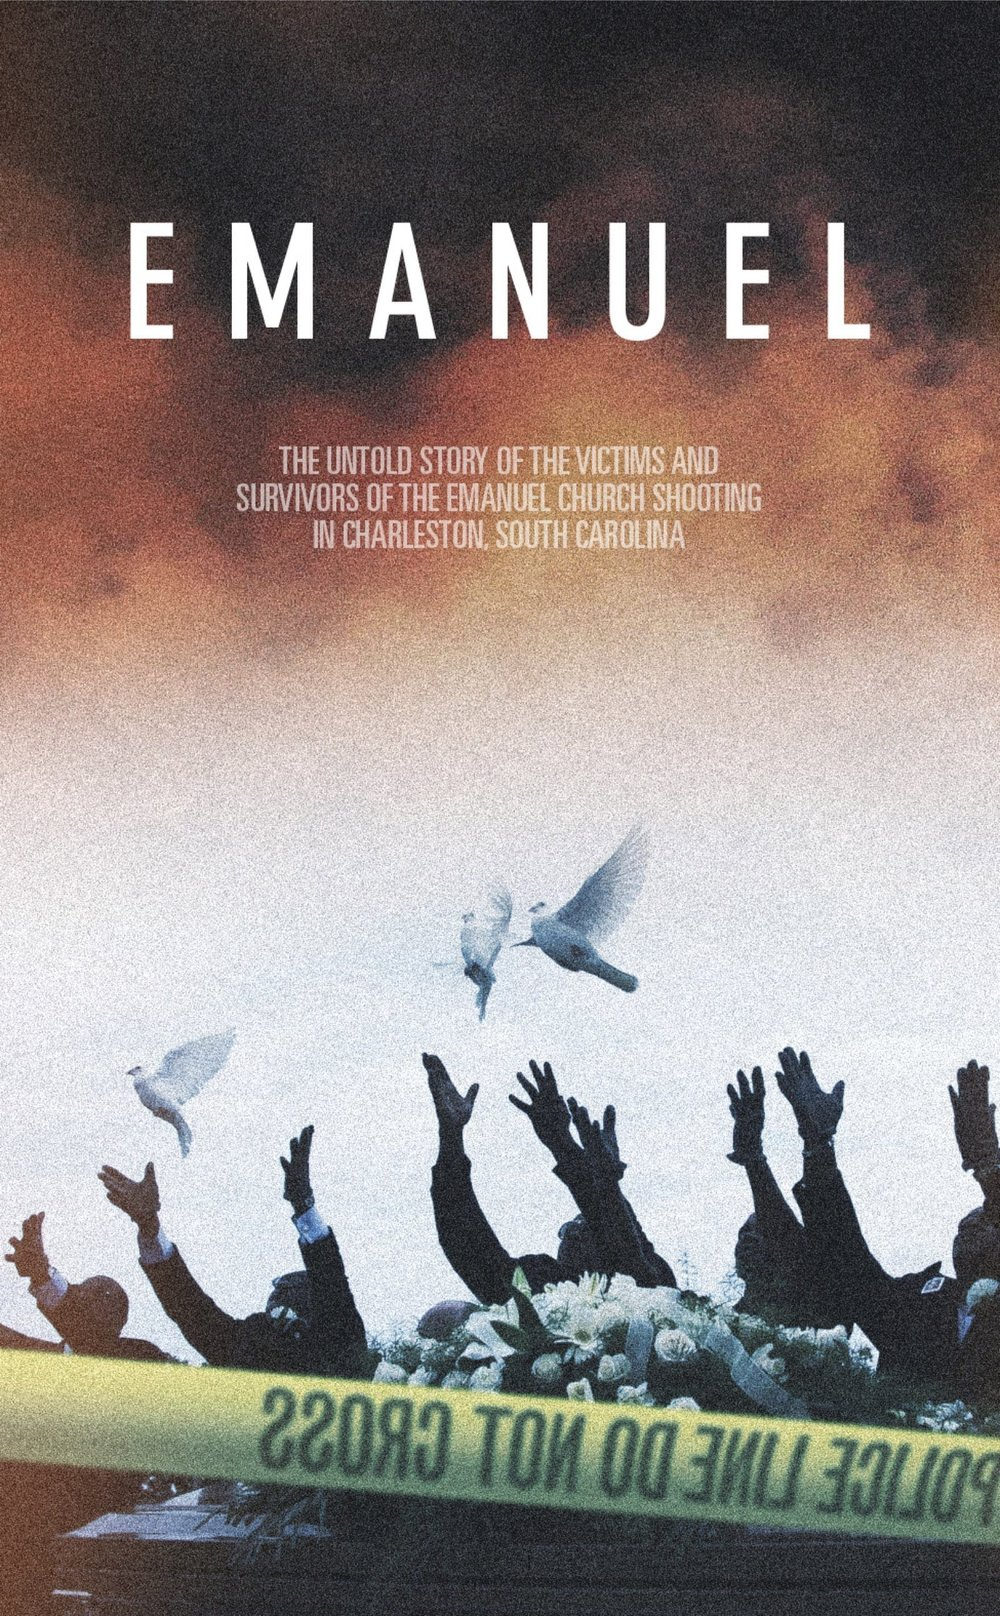 Emanuel Documentary